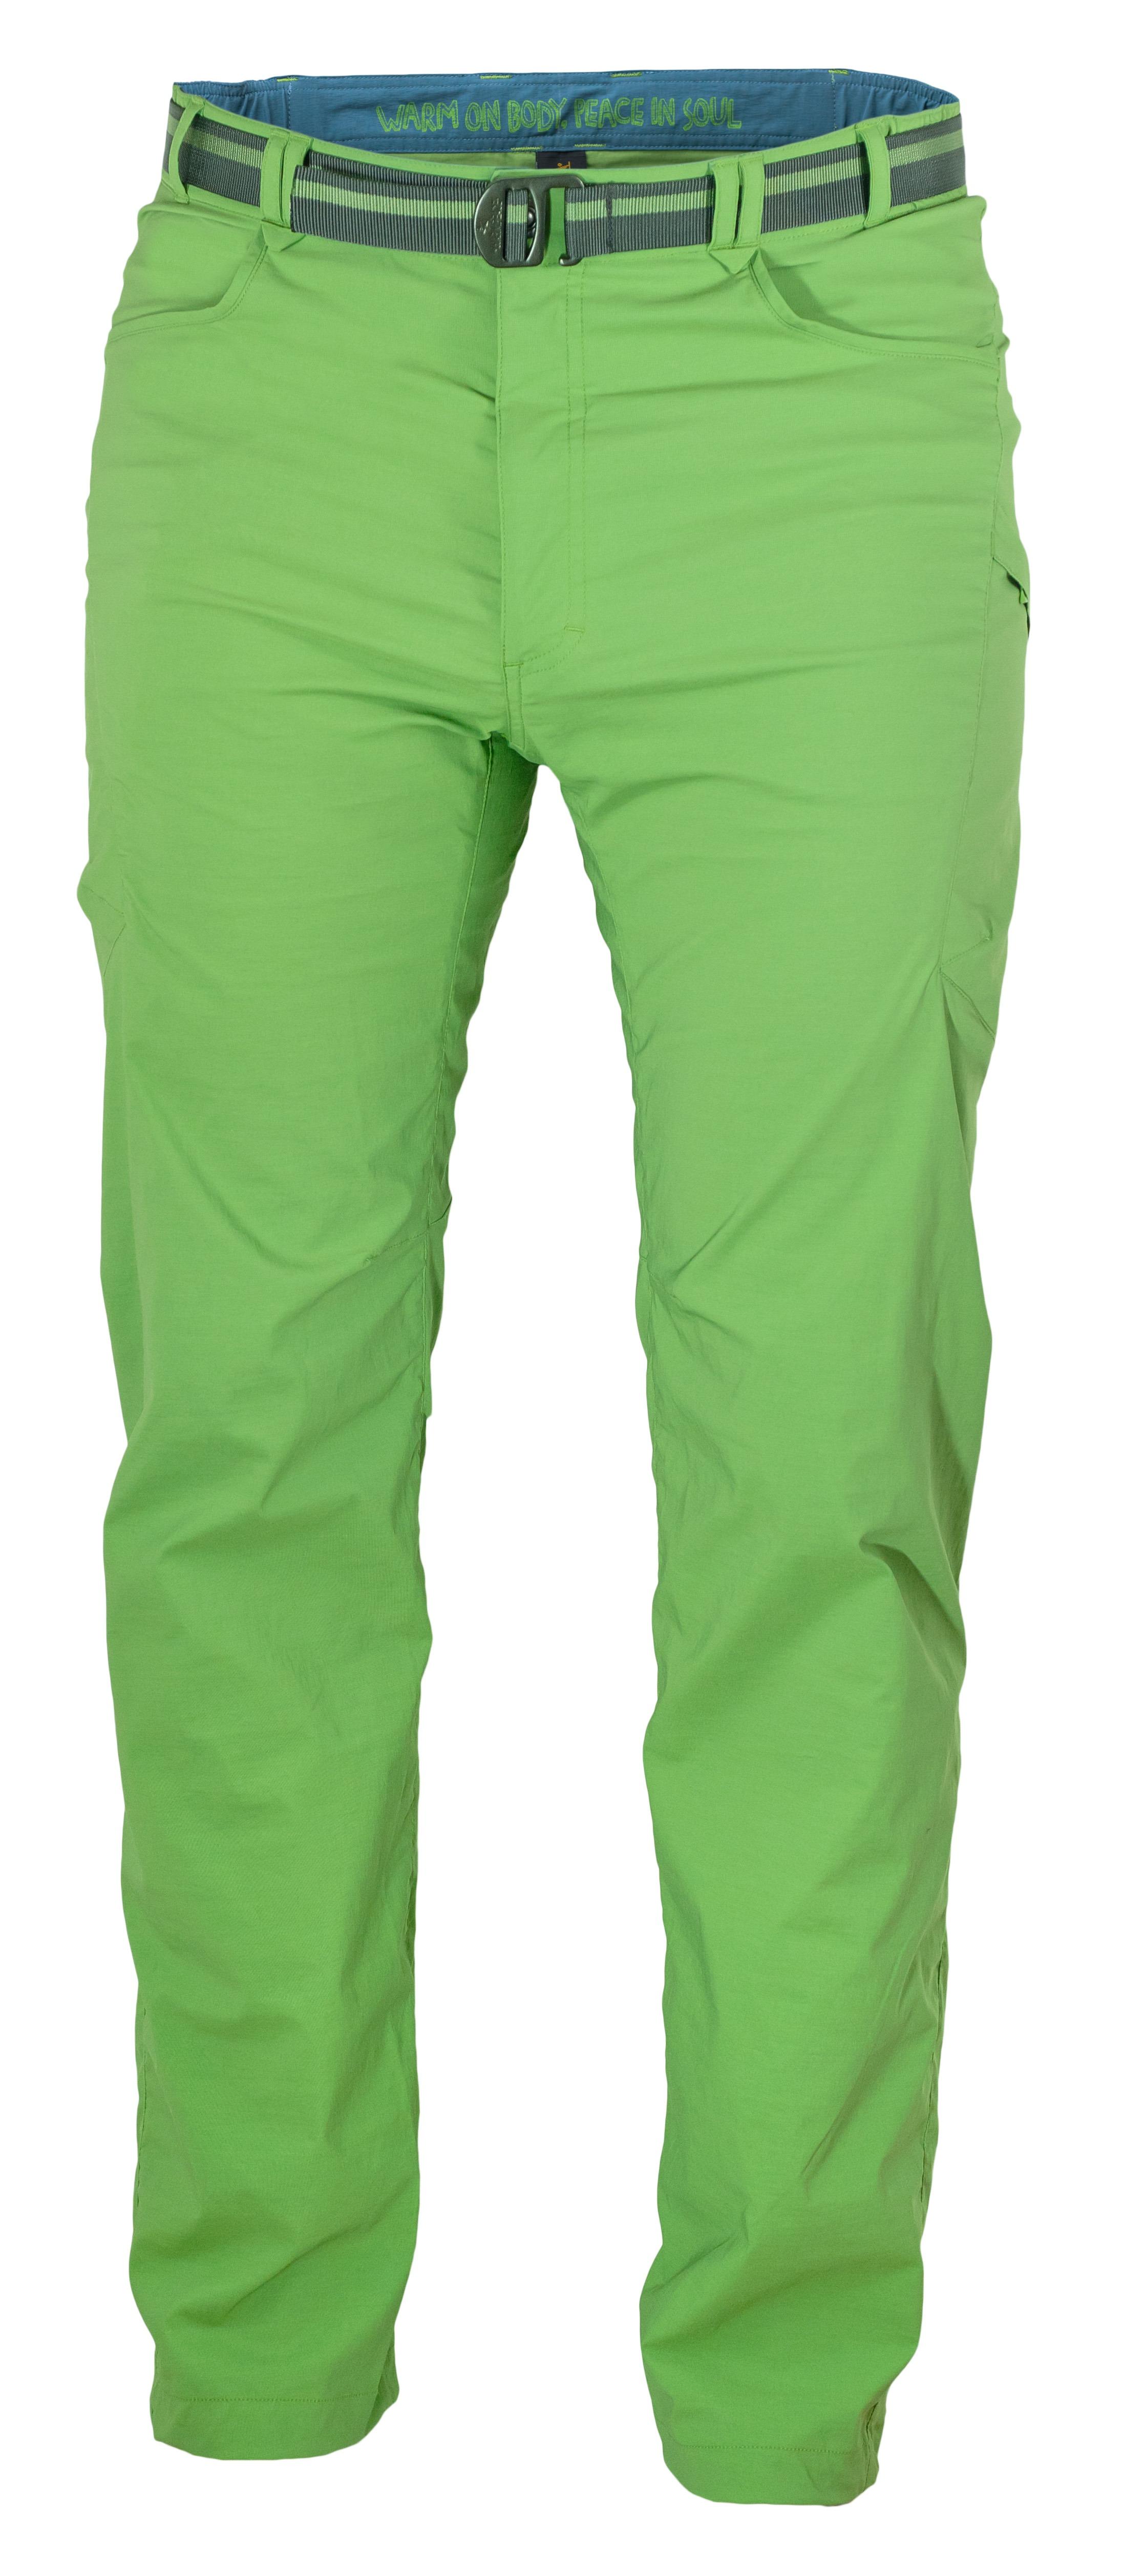 Pantaloni Trekking Warmpeace Flint - Verde